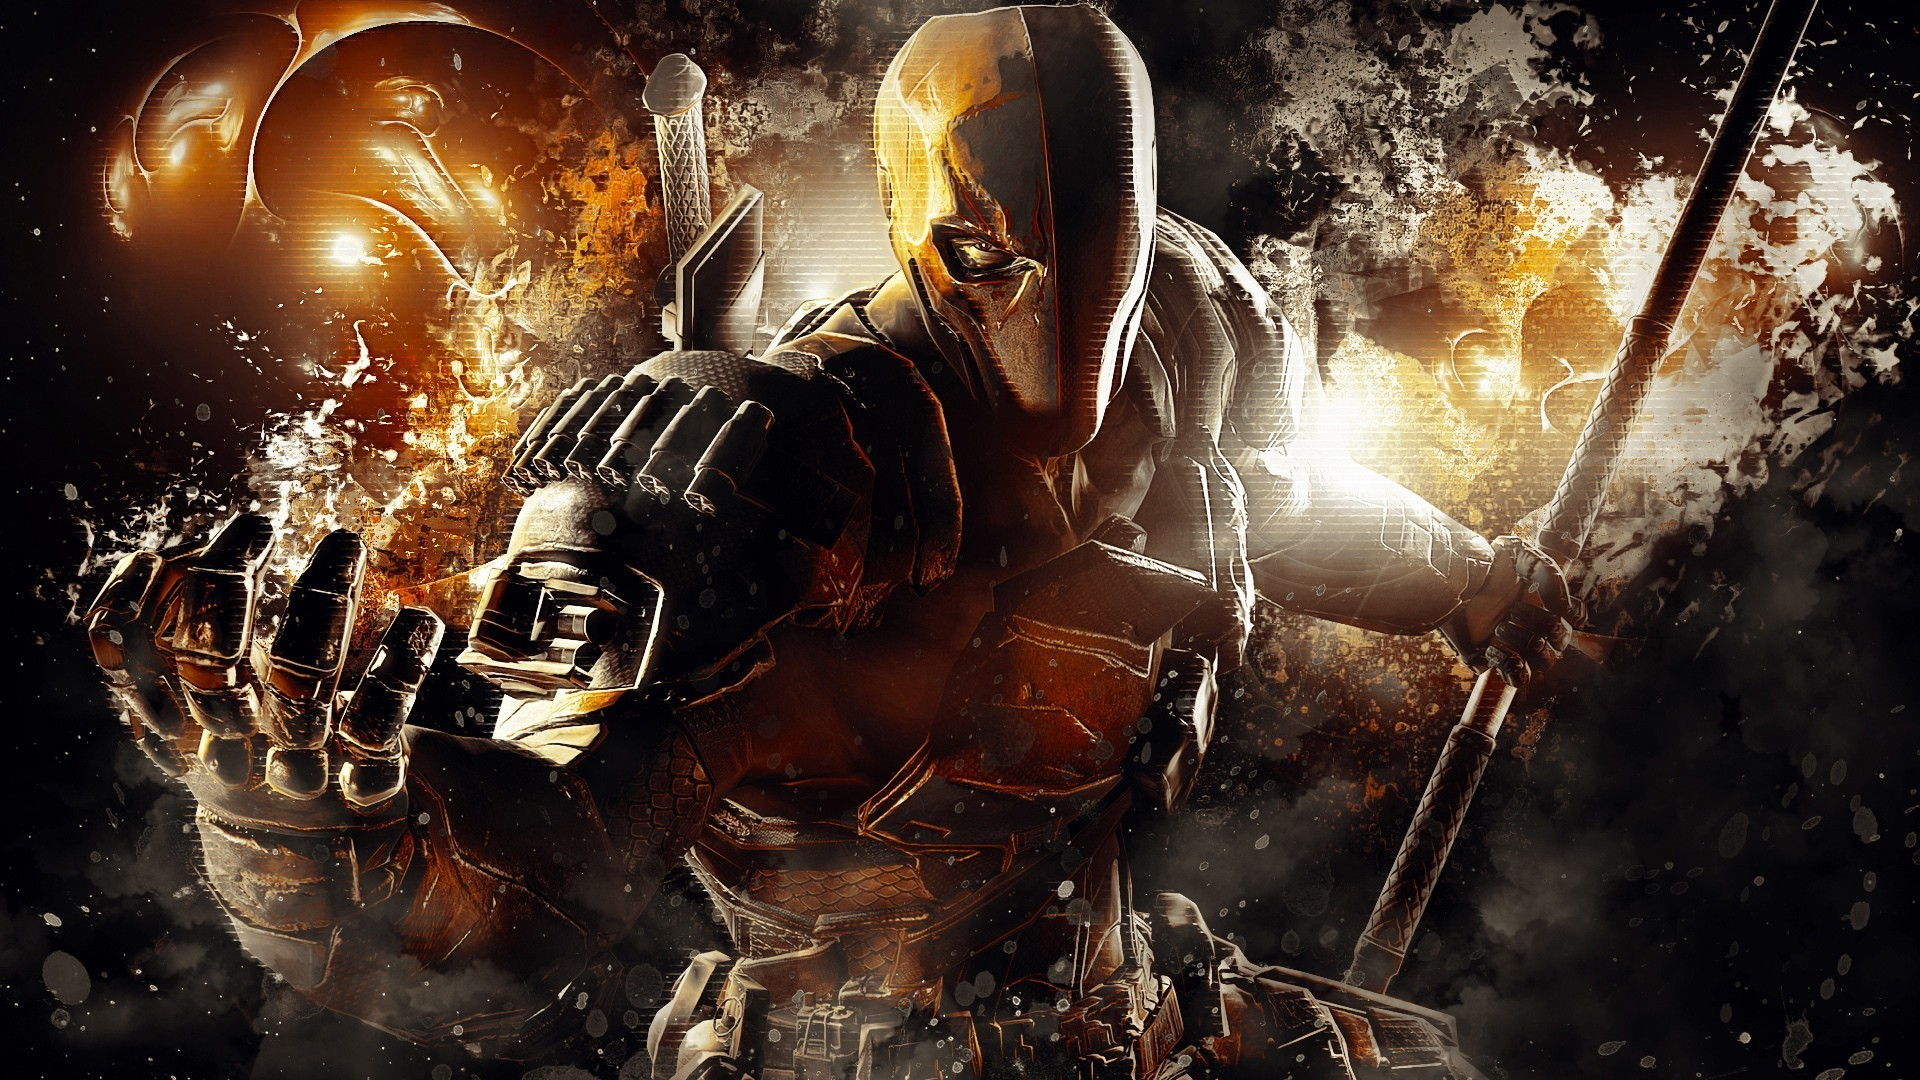 artwork, Video Games, Deathstroke, DC Comics, Batman: Arkham Origins, Mask,  Warrior, Video Game Characters Wallpapers HD / Desktop and Mobile  Backgrounds